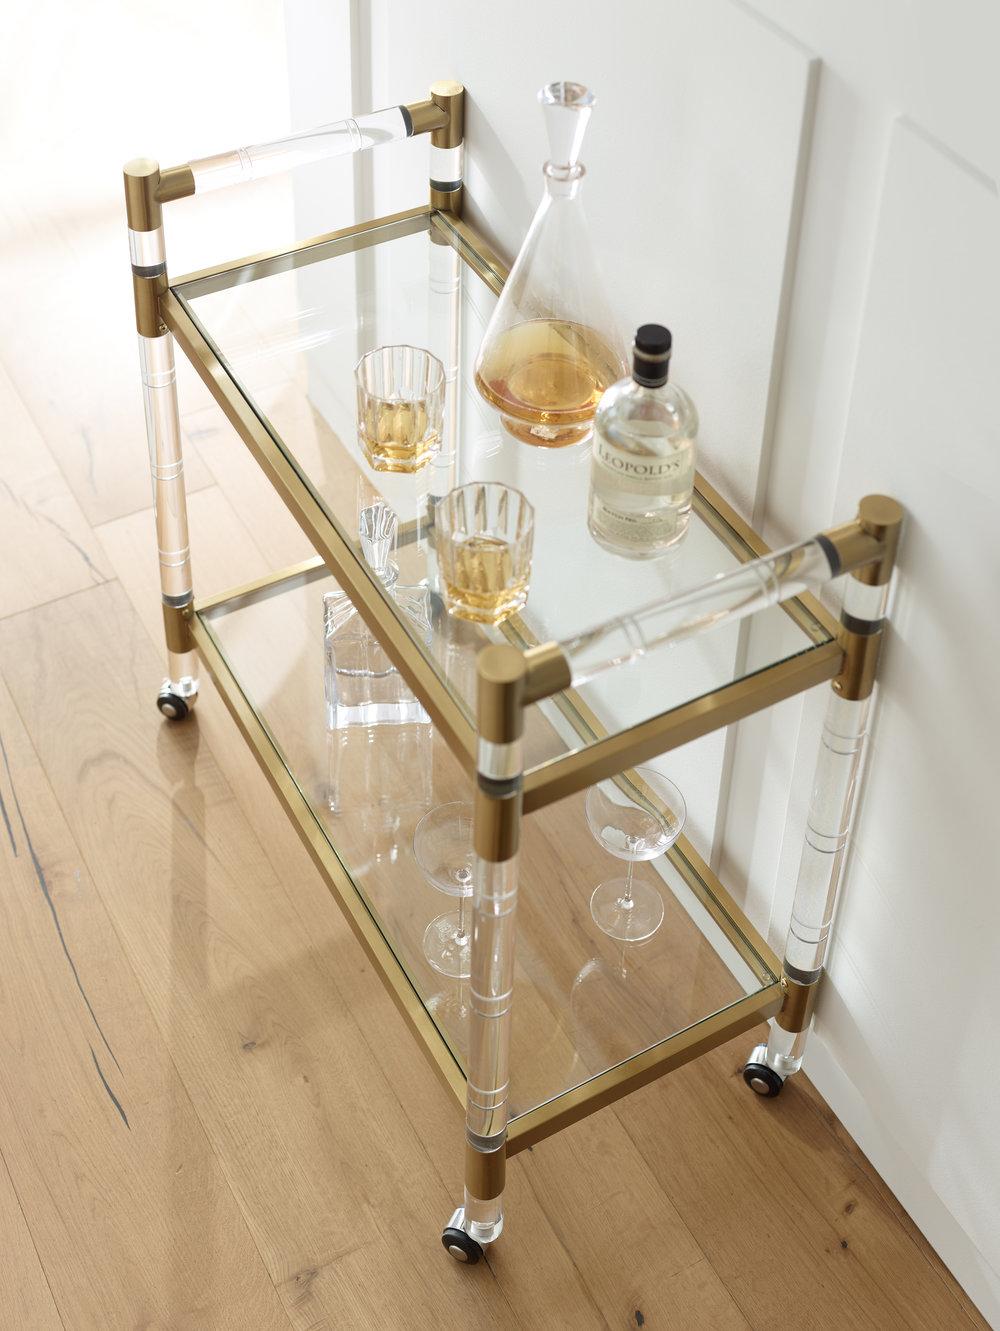 181023-contemporary-modern-furniture-1k514-h.jpg